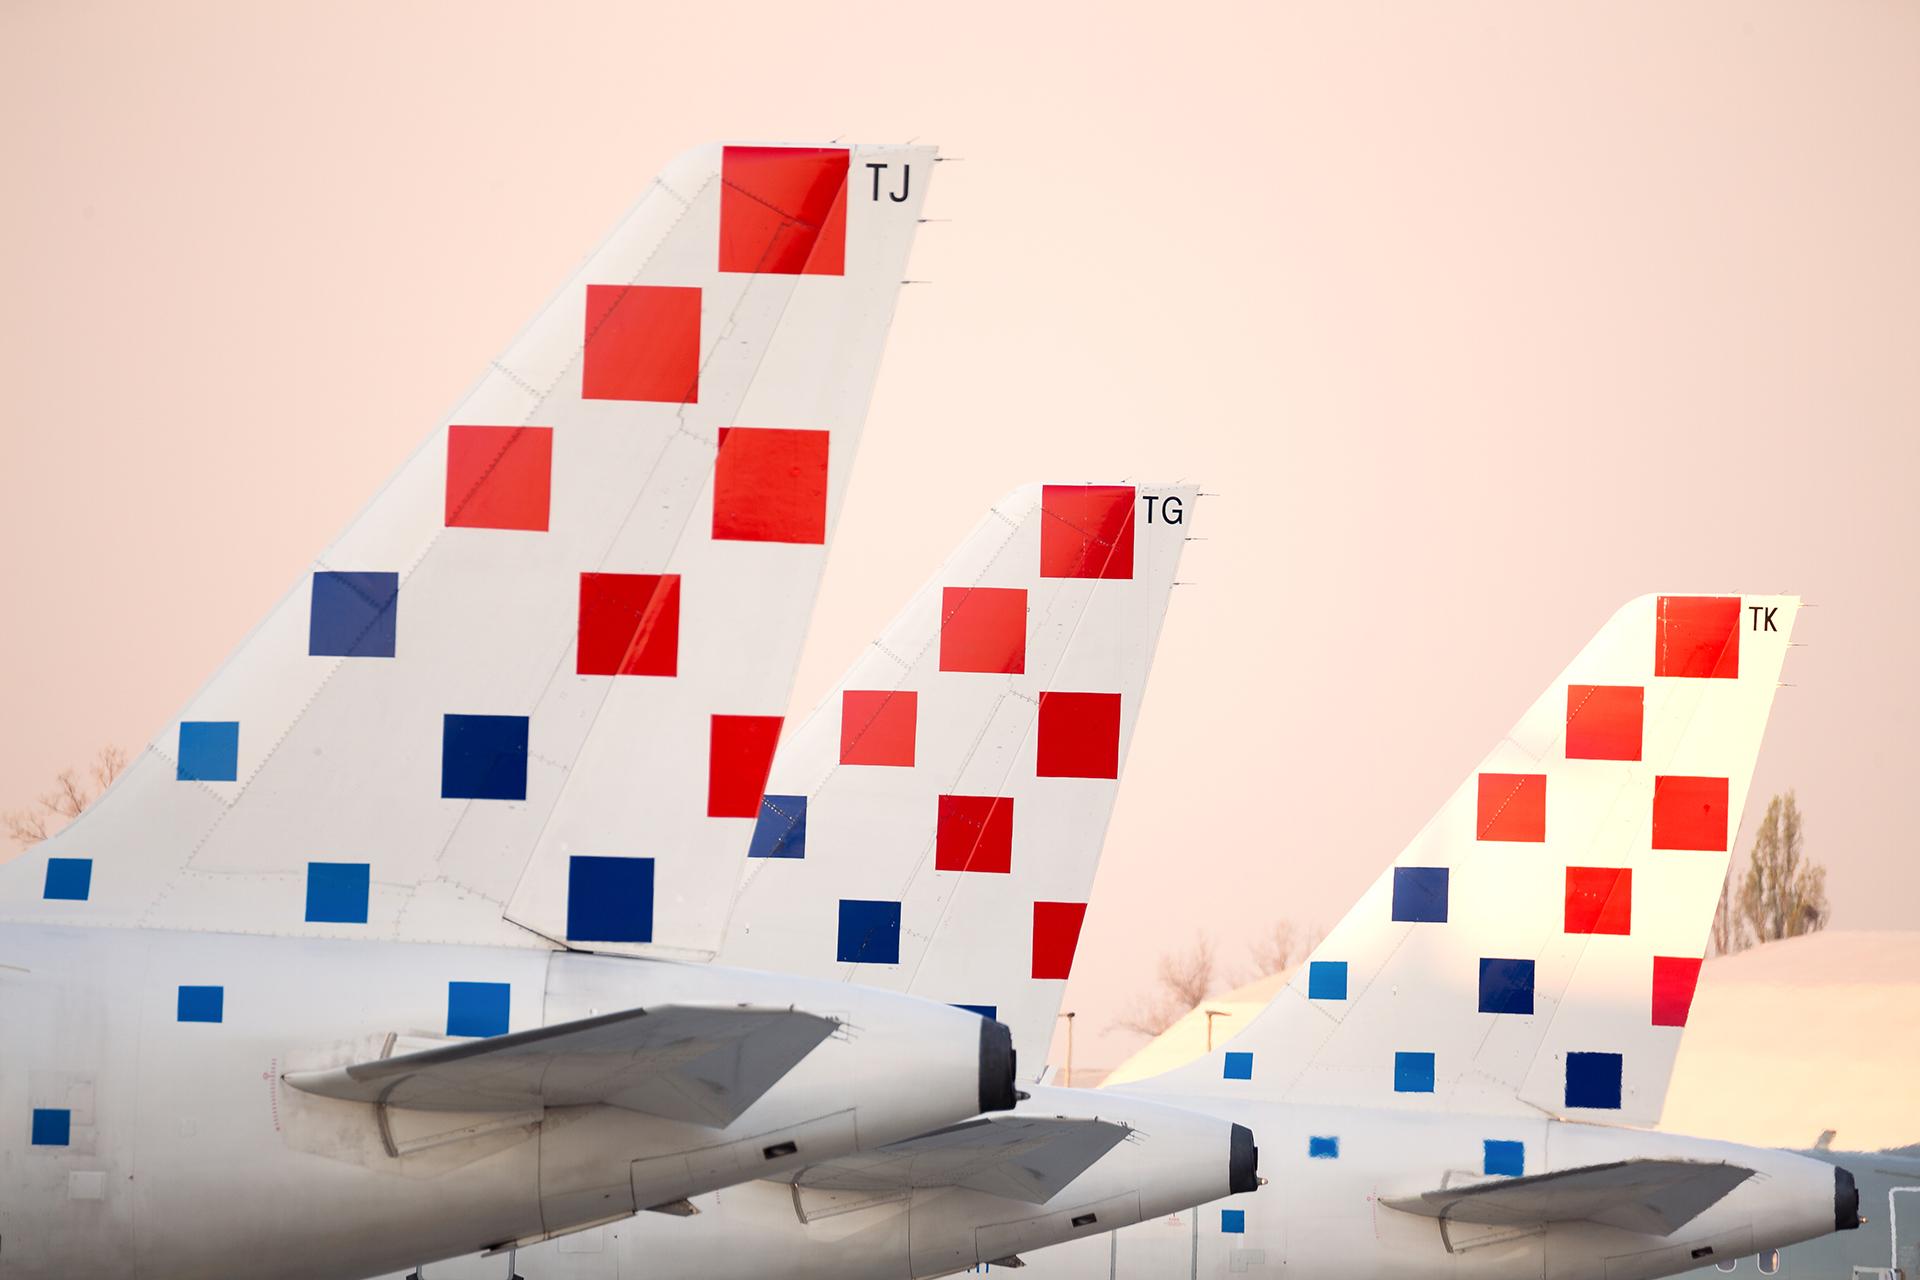 Foto: Croatia Airlines (Foto: J. Skof)